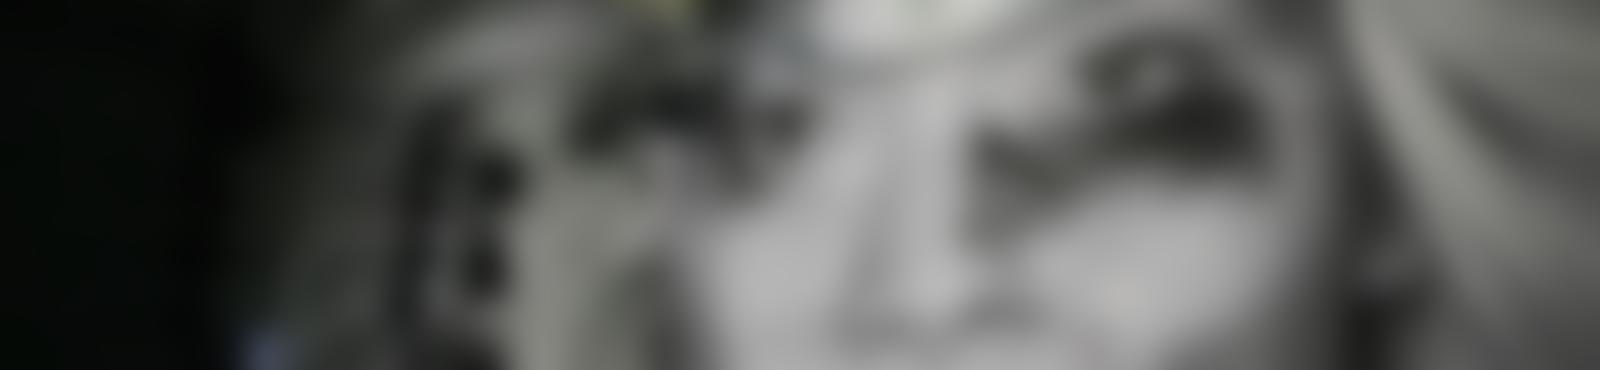 Blurred 56fb4db2 e493 40c3 aecc d4f4e81b3fa3